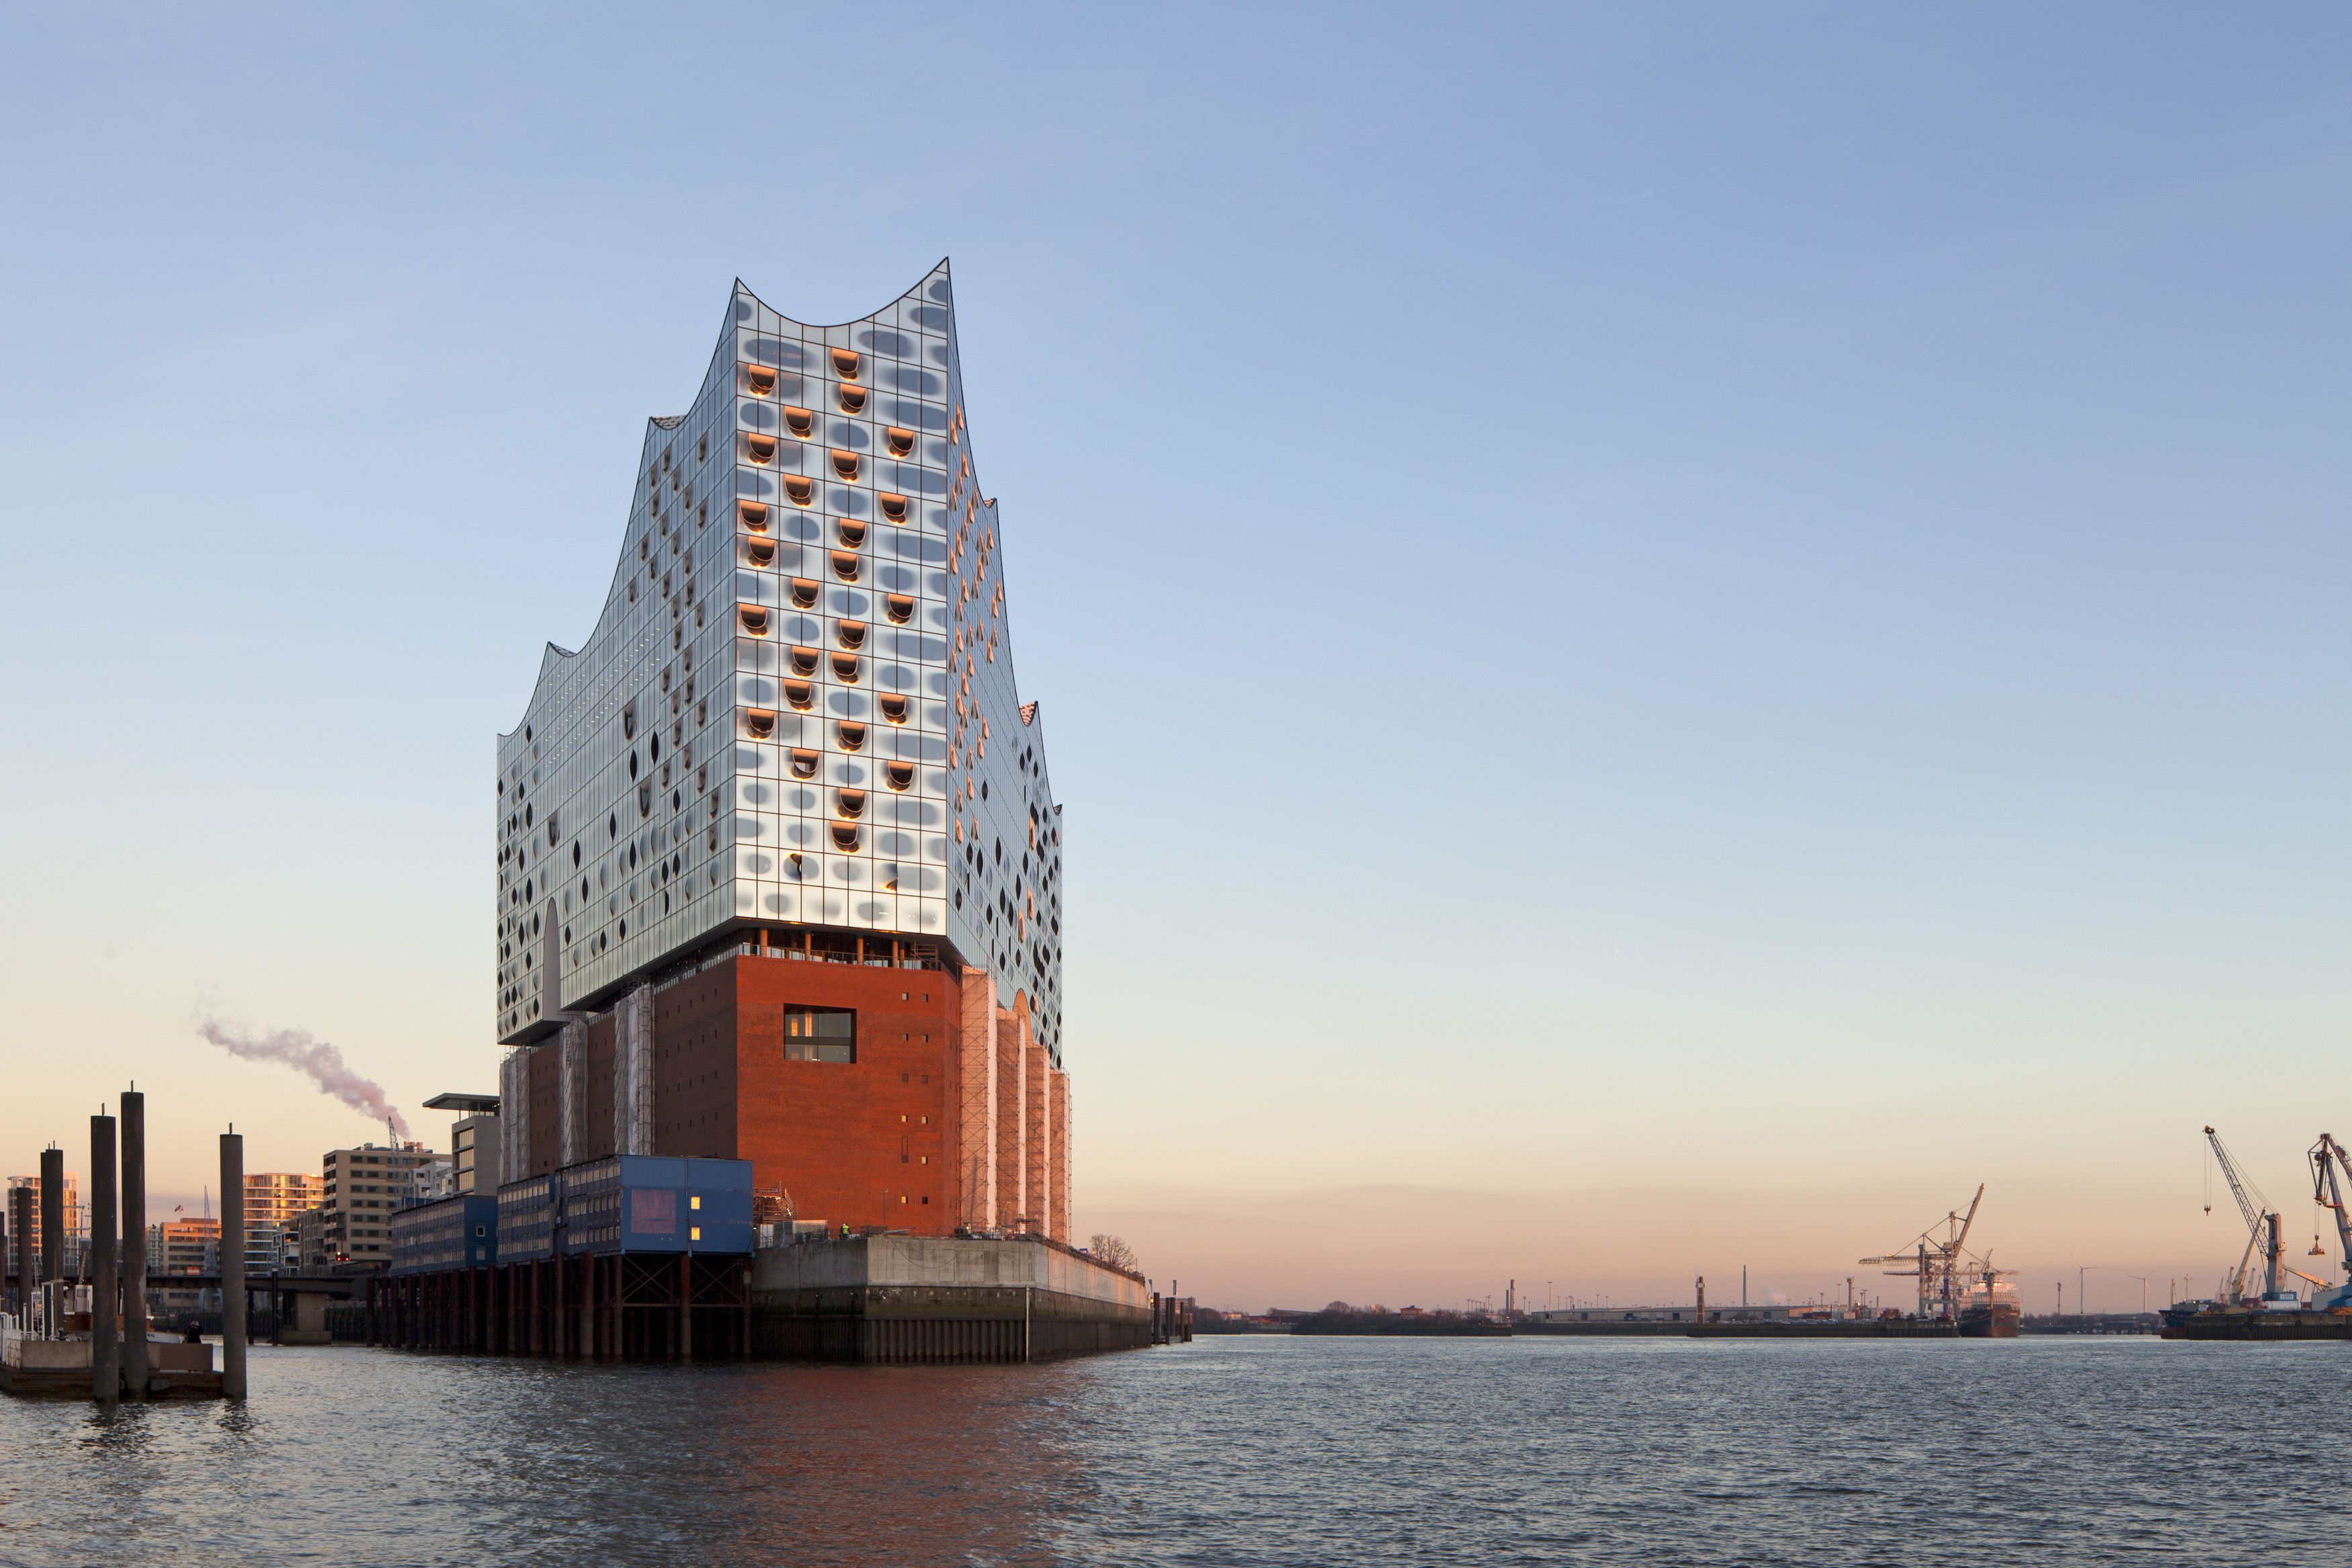 Dd8150f94895625586e6ec9db3471493 Elbphilharmonie Hamburg Is Giving Away 1000 Tickets For The Opening Conc Amazing Architecture Elbphilharmonie Hamburg Building